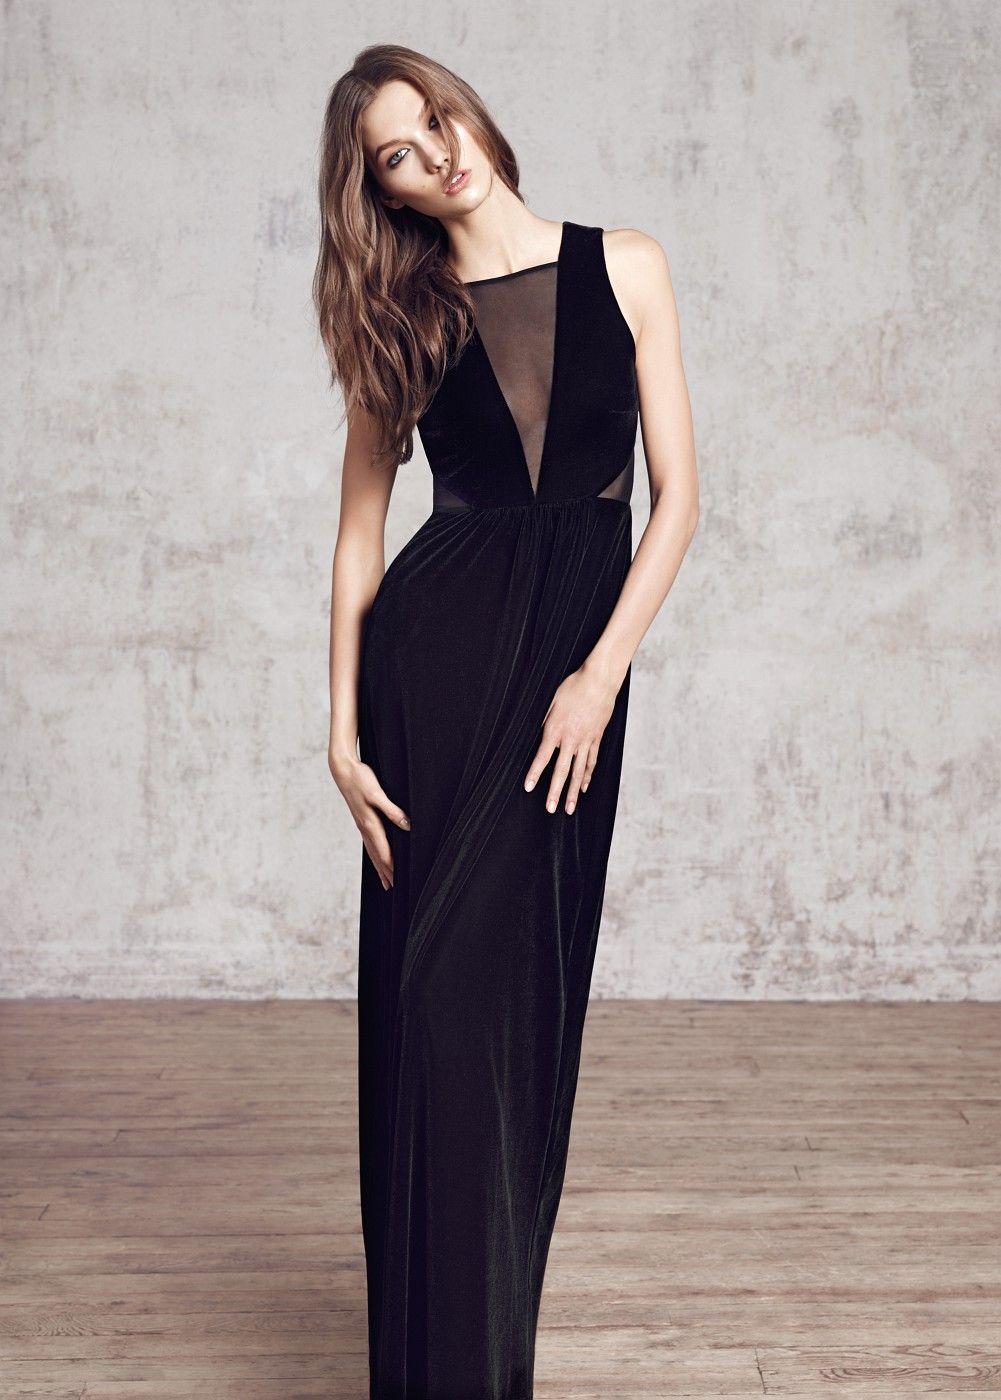 Lange velours jurk dames karlie kloss prom and clothes